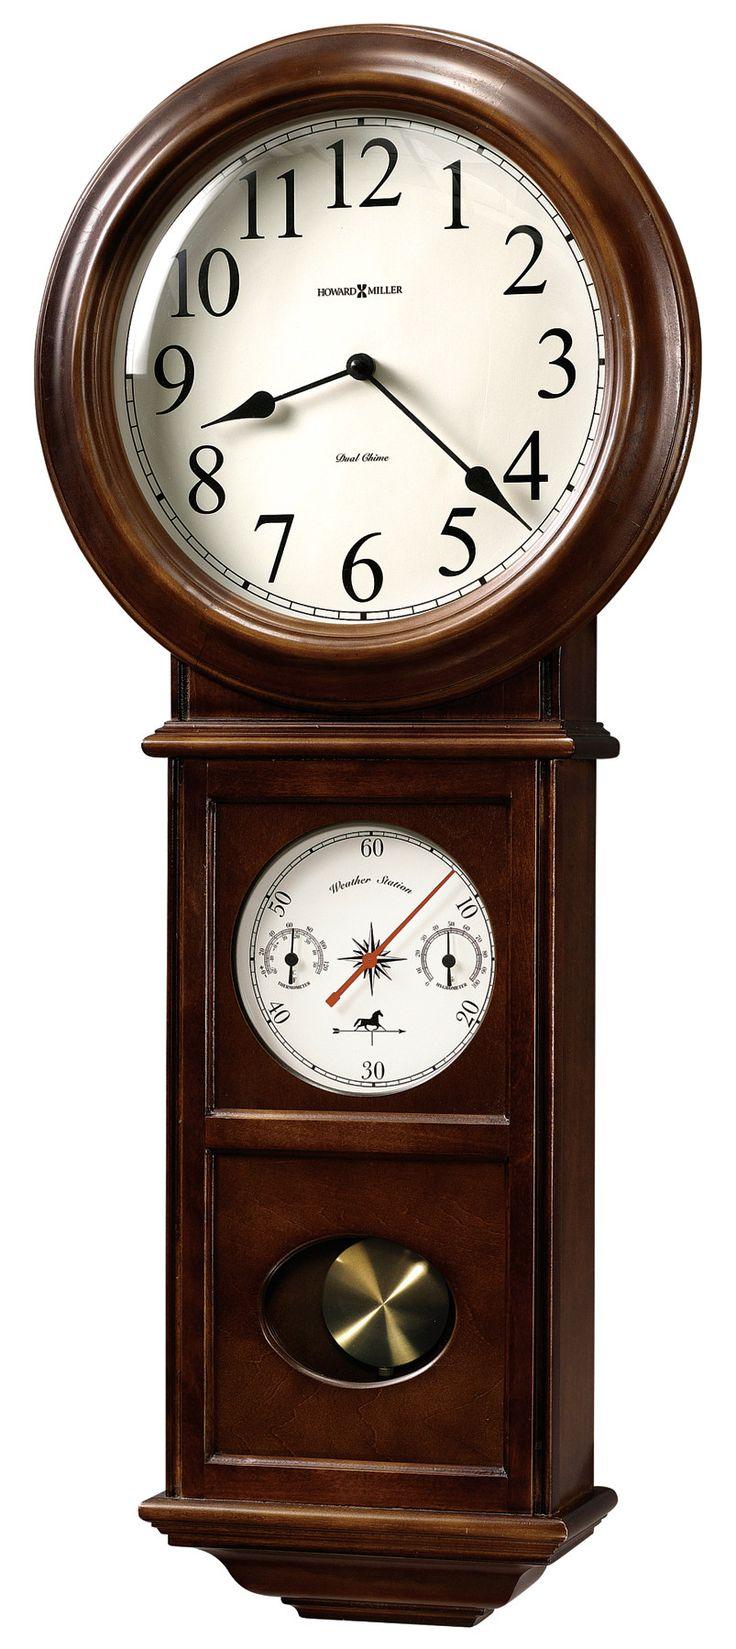 66 best key wound wall clocks and mantel clocks images on 66 best key wound wall clocks and mantel clocks images on pinterest mantels wall clocks and mantel clocks amipublicfo Images